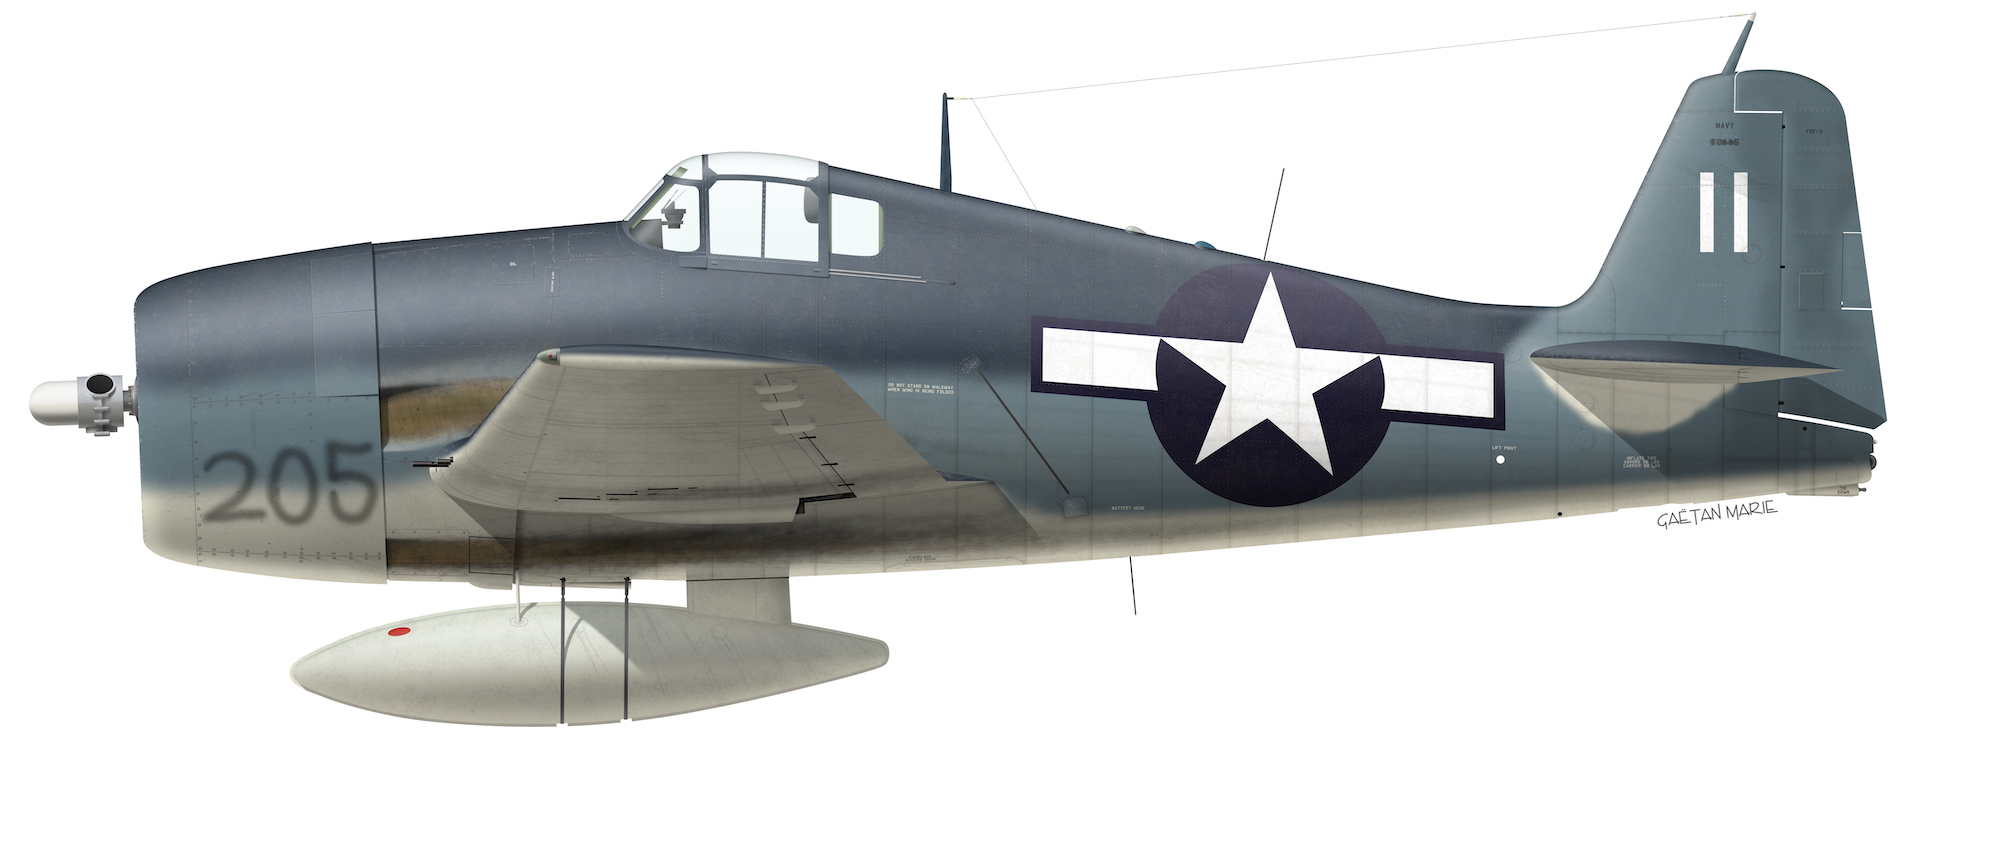 USN, F6F-3 BuNo xxxxx, Gus Sermos, VF-50, USS Bataan